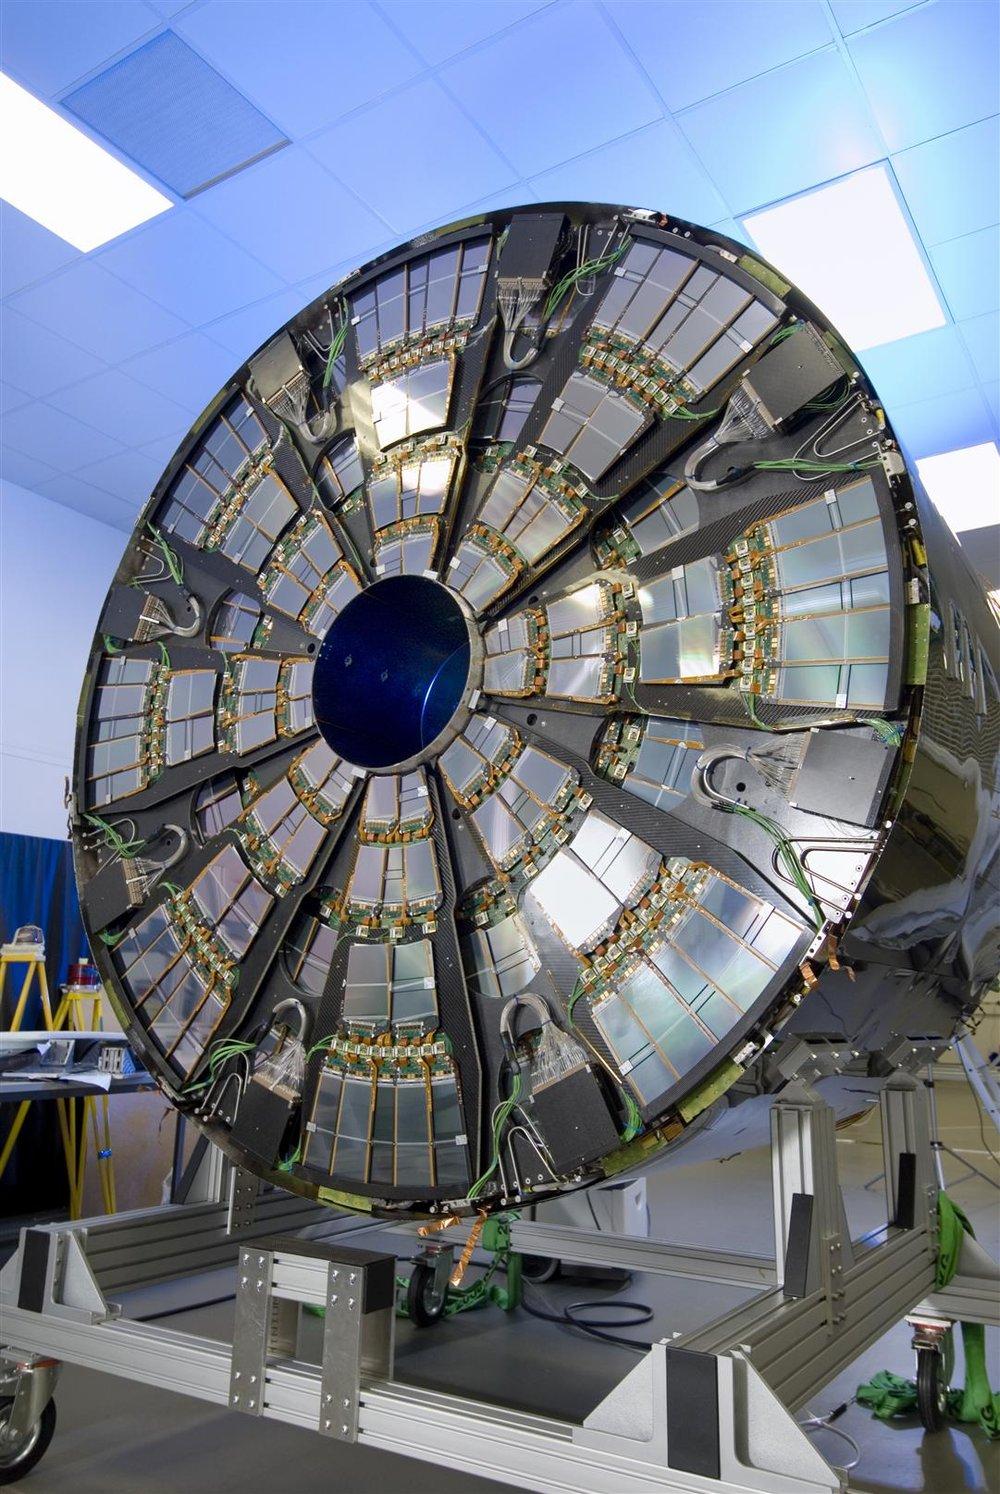 LHC_restart-04.jpg